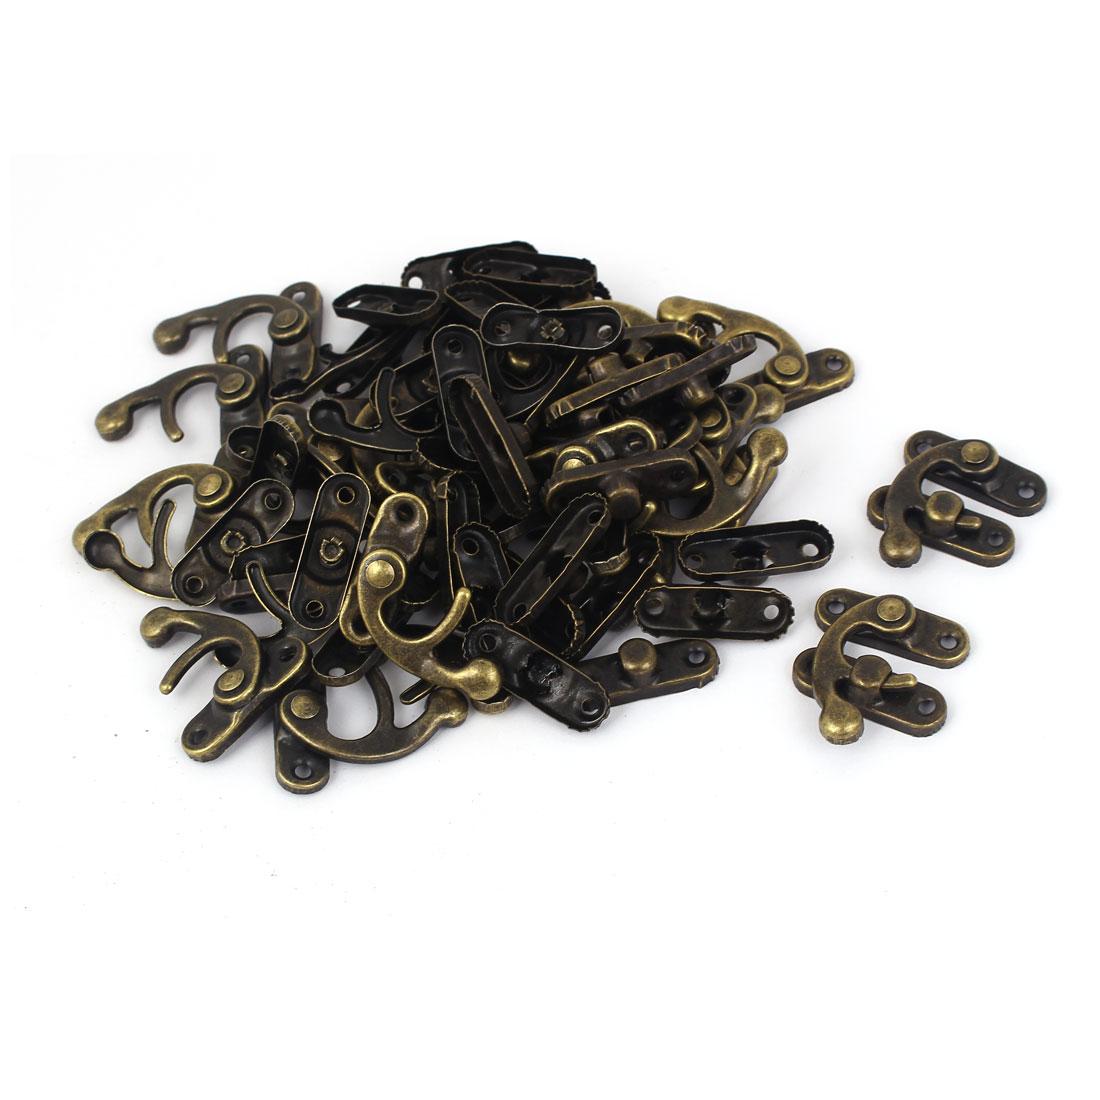 Jewelry Case Gift Box Lock Latch Buckle Clasp Bronze Tone 32x27mm 30pcs - image 3 of 3